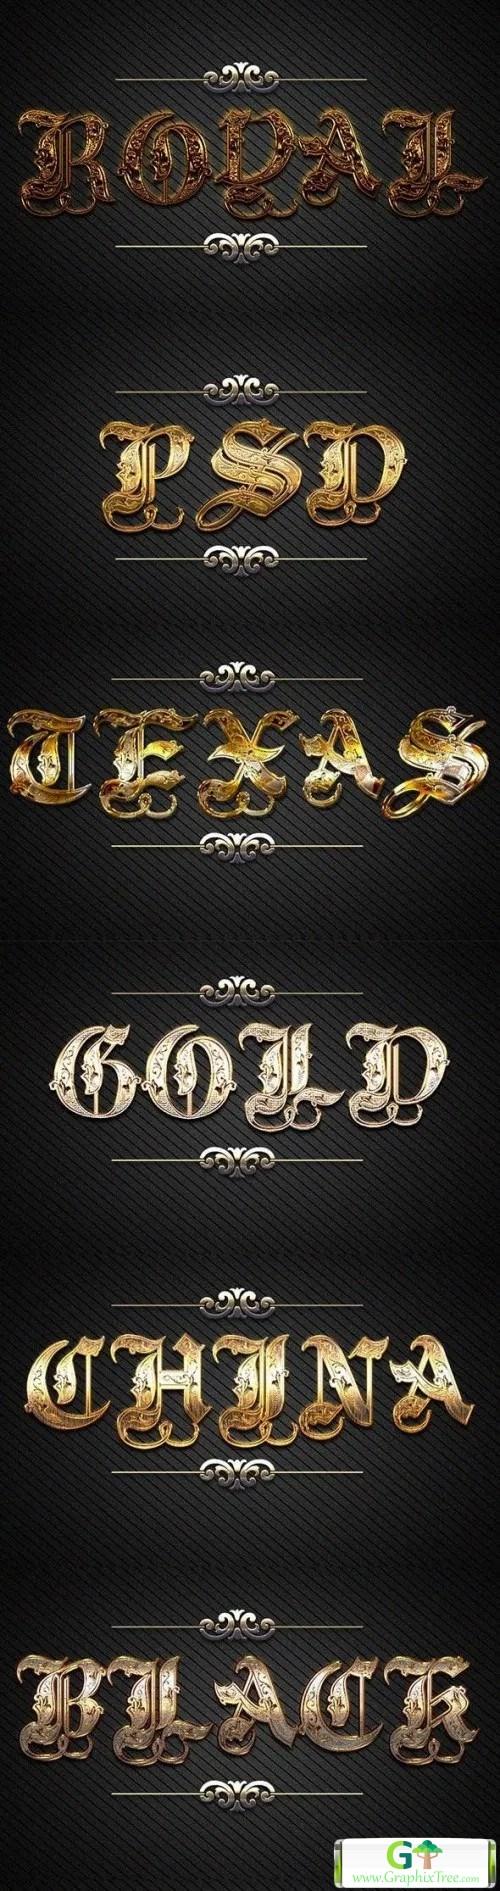 3D Gold Text 10 Styles D_47 21143260